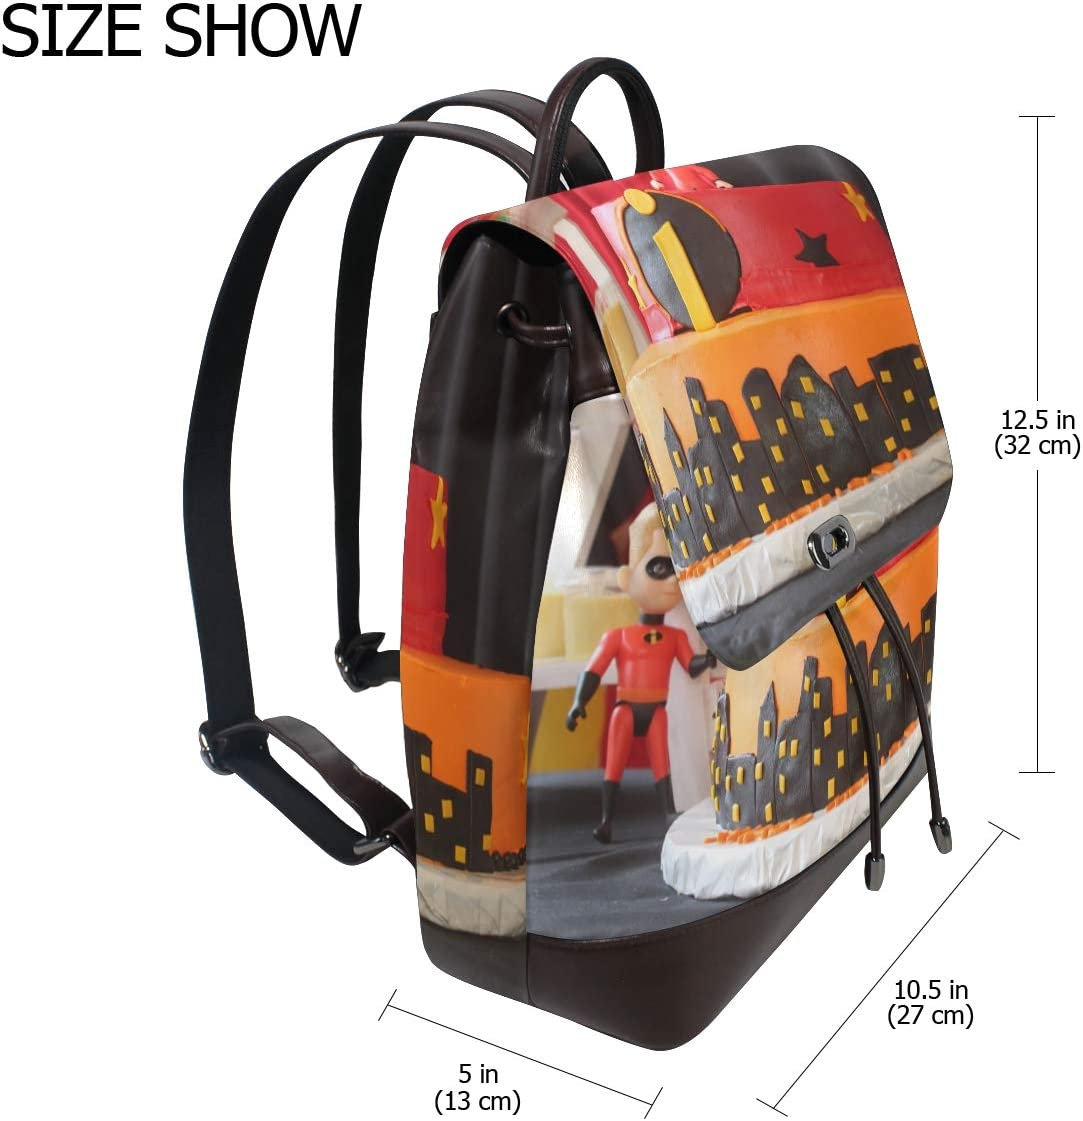 Shopping Bag School Bag Travel Bag Backpack Storage Bag For Men Women Girls Boys Personalized Pattern Birthday Cake